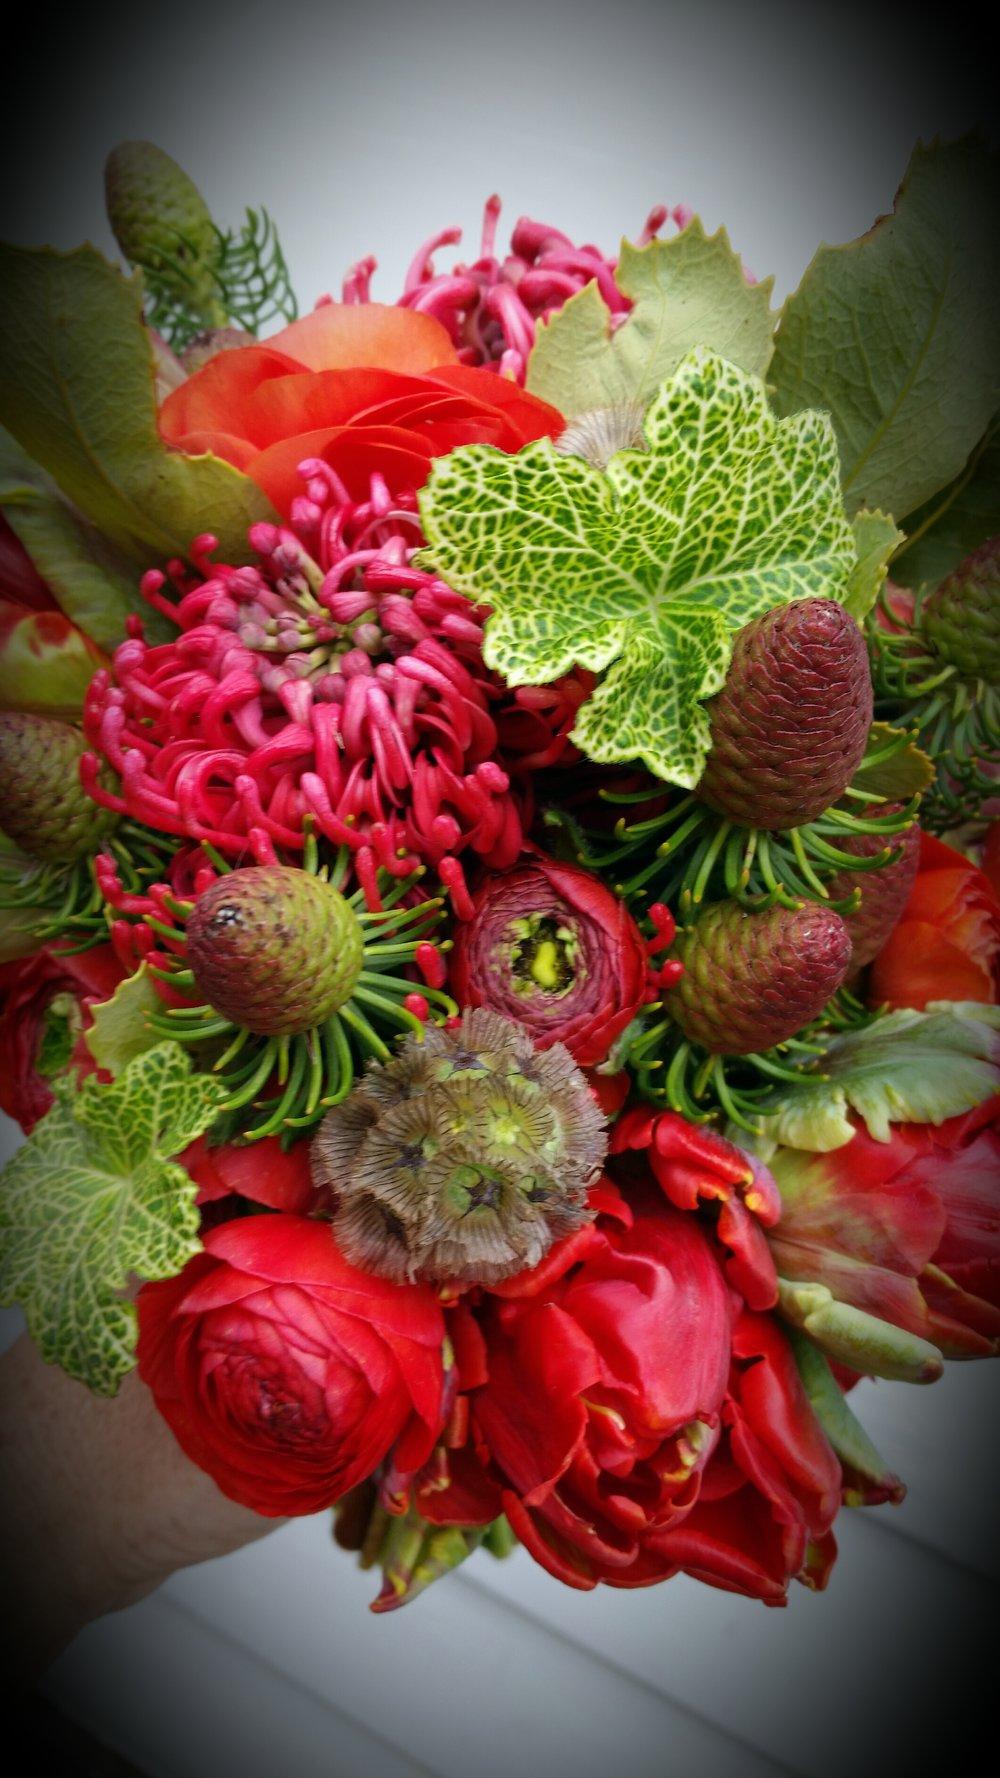 sarahs bouquet.jpg